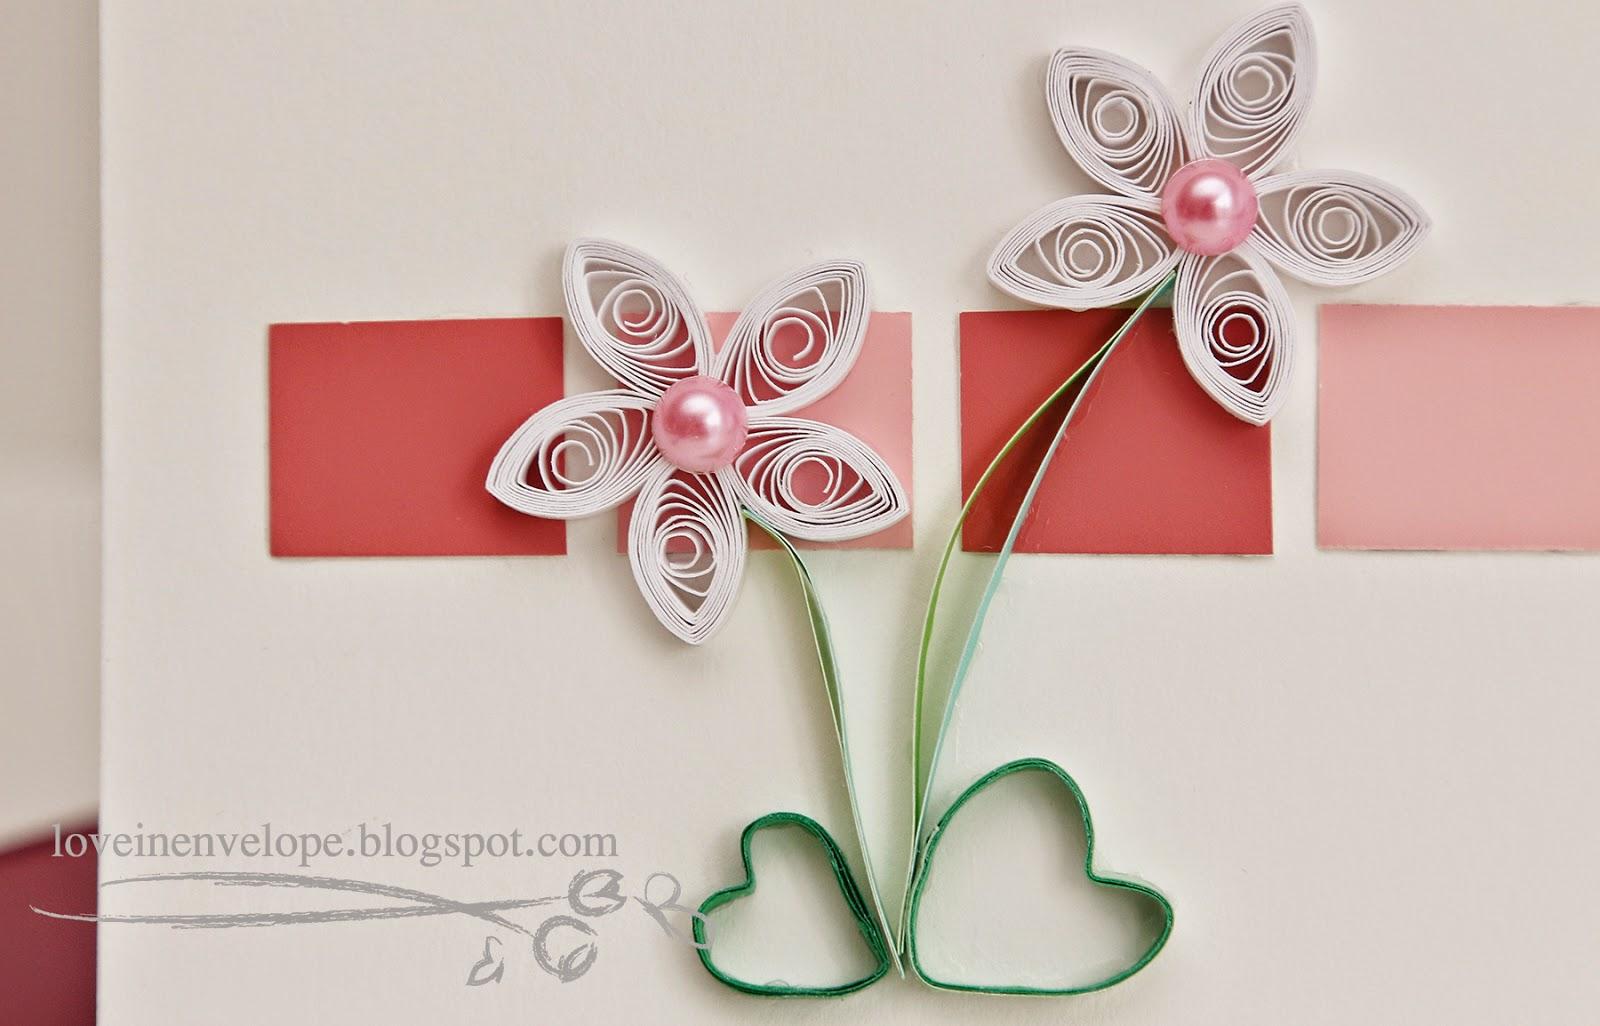 Love In Envelope Happy 31st Birthday Handmade Quilled White Flowers